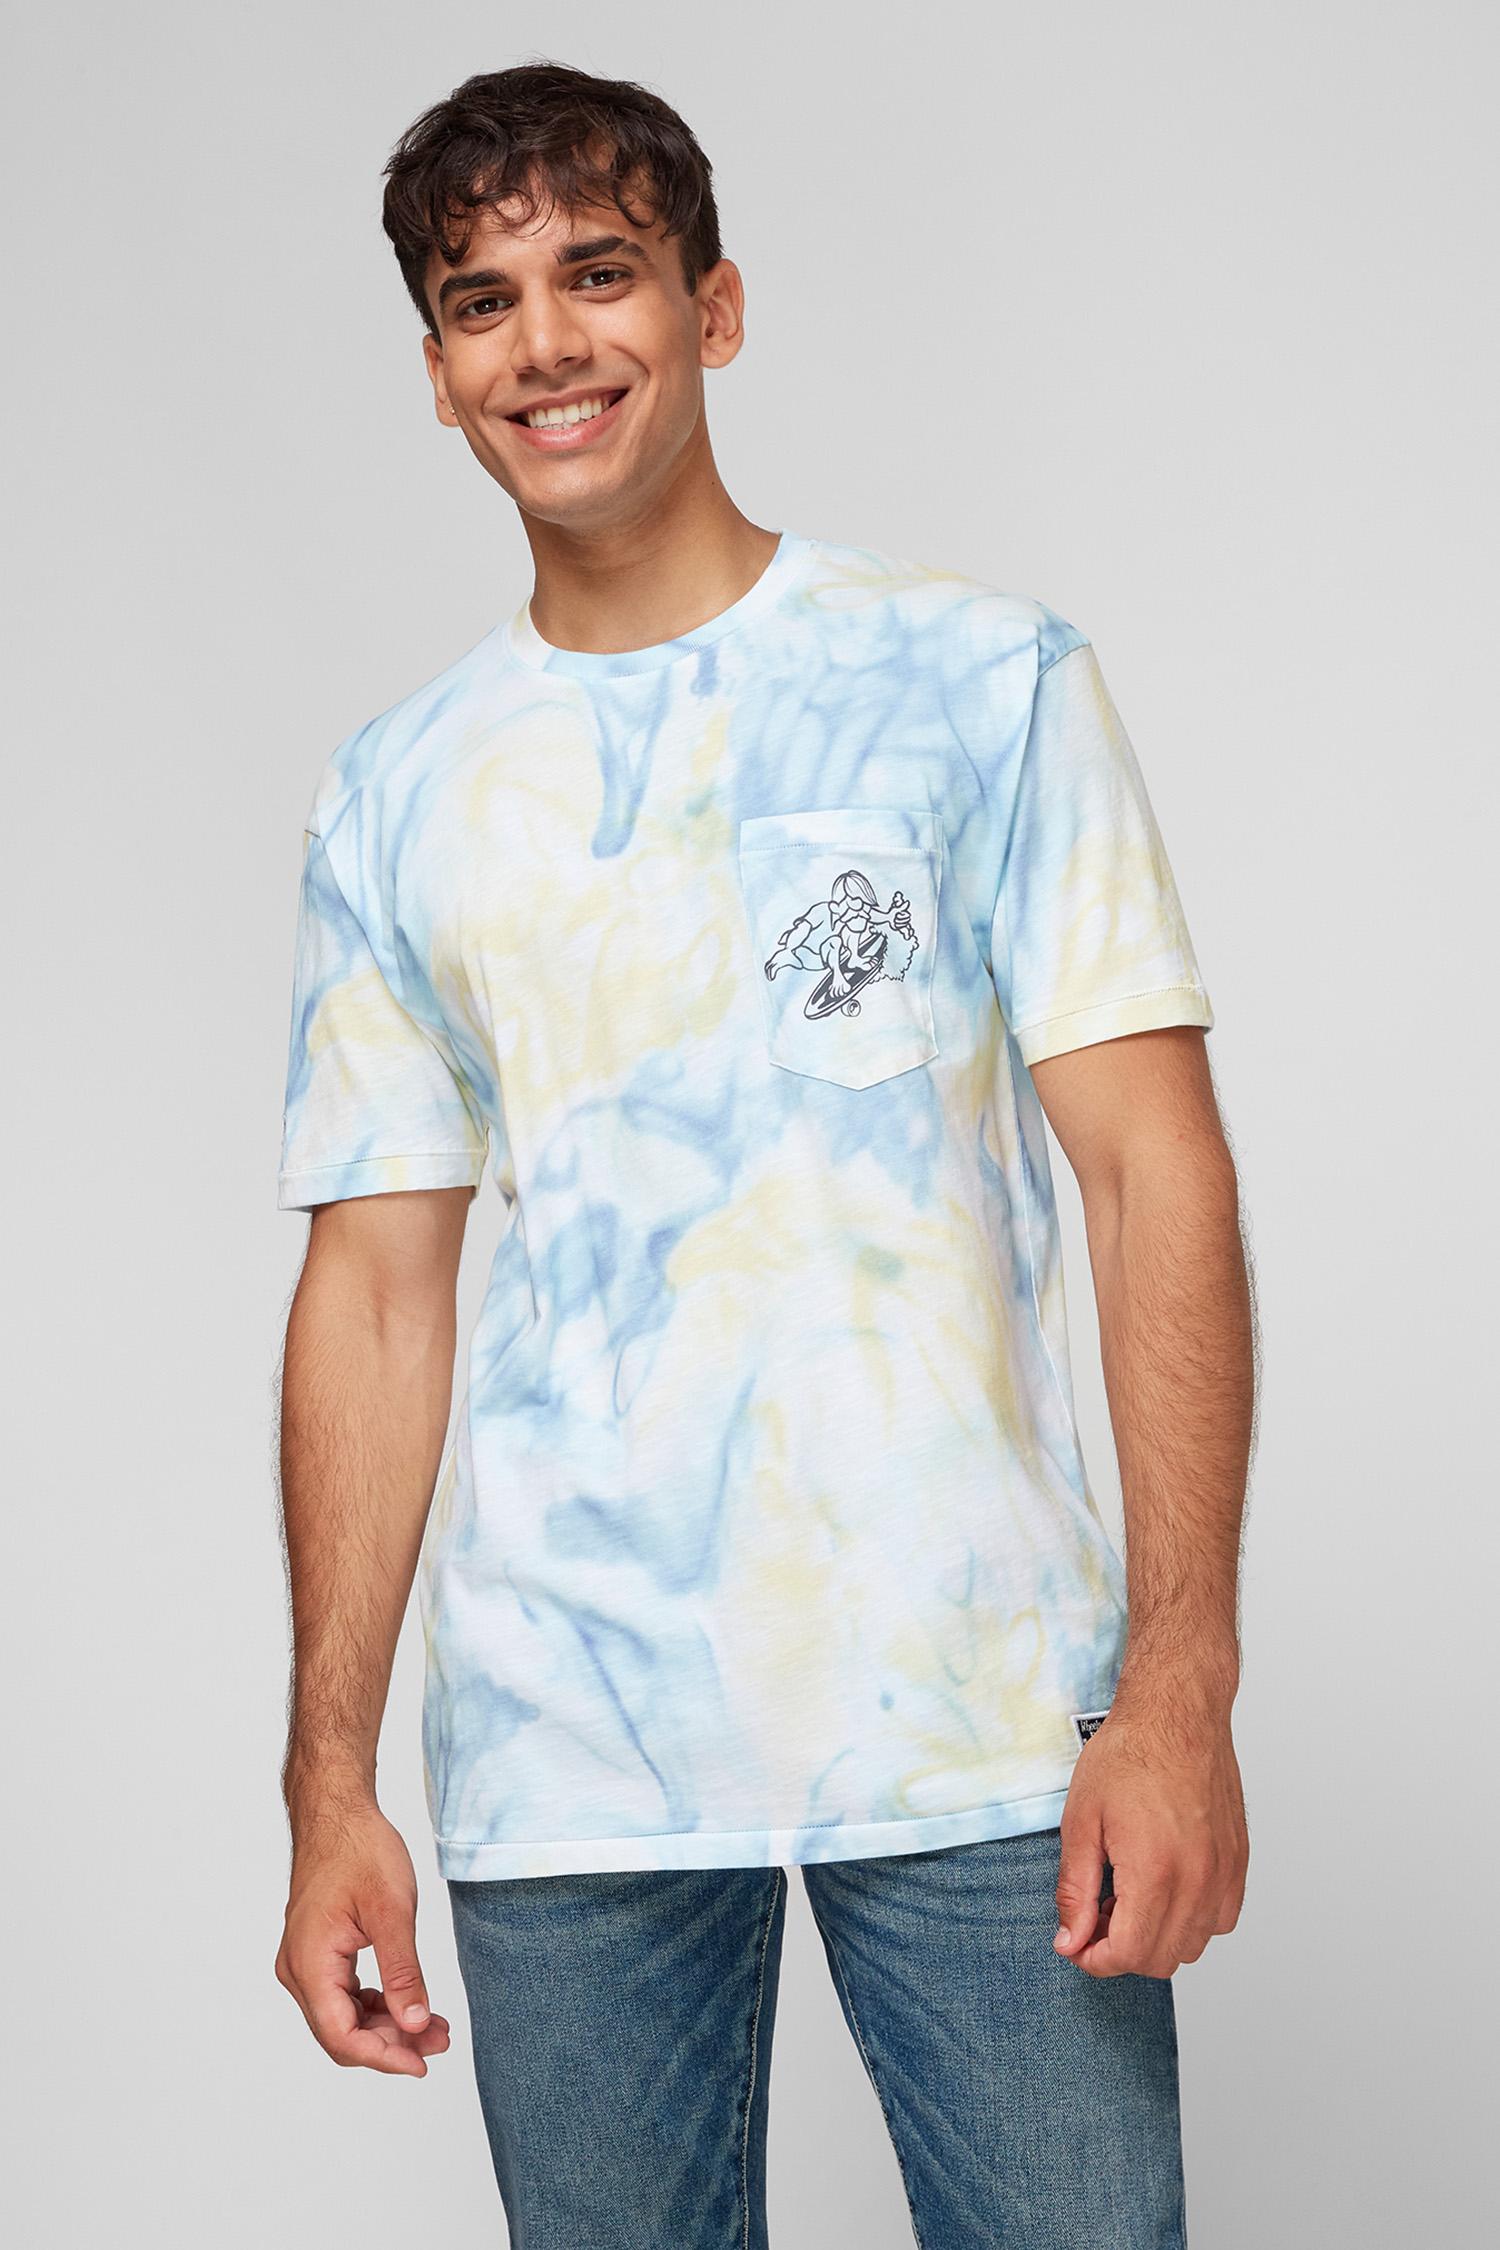 Чоловіча футболка з візерунком SuperDry M1011020A;VUC